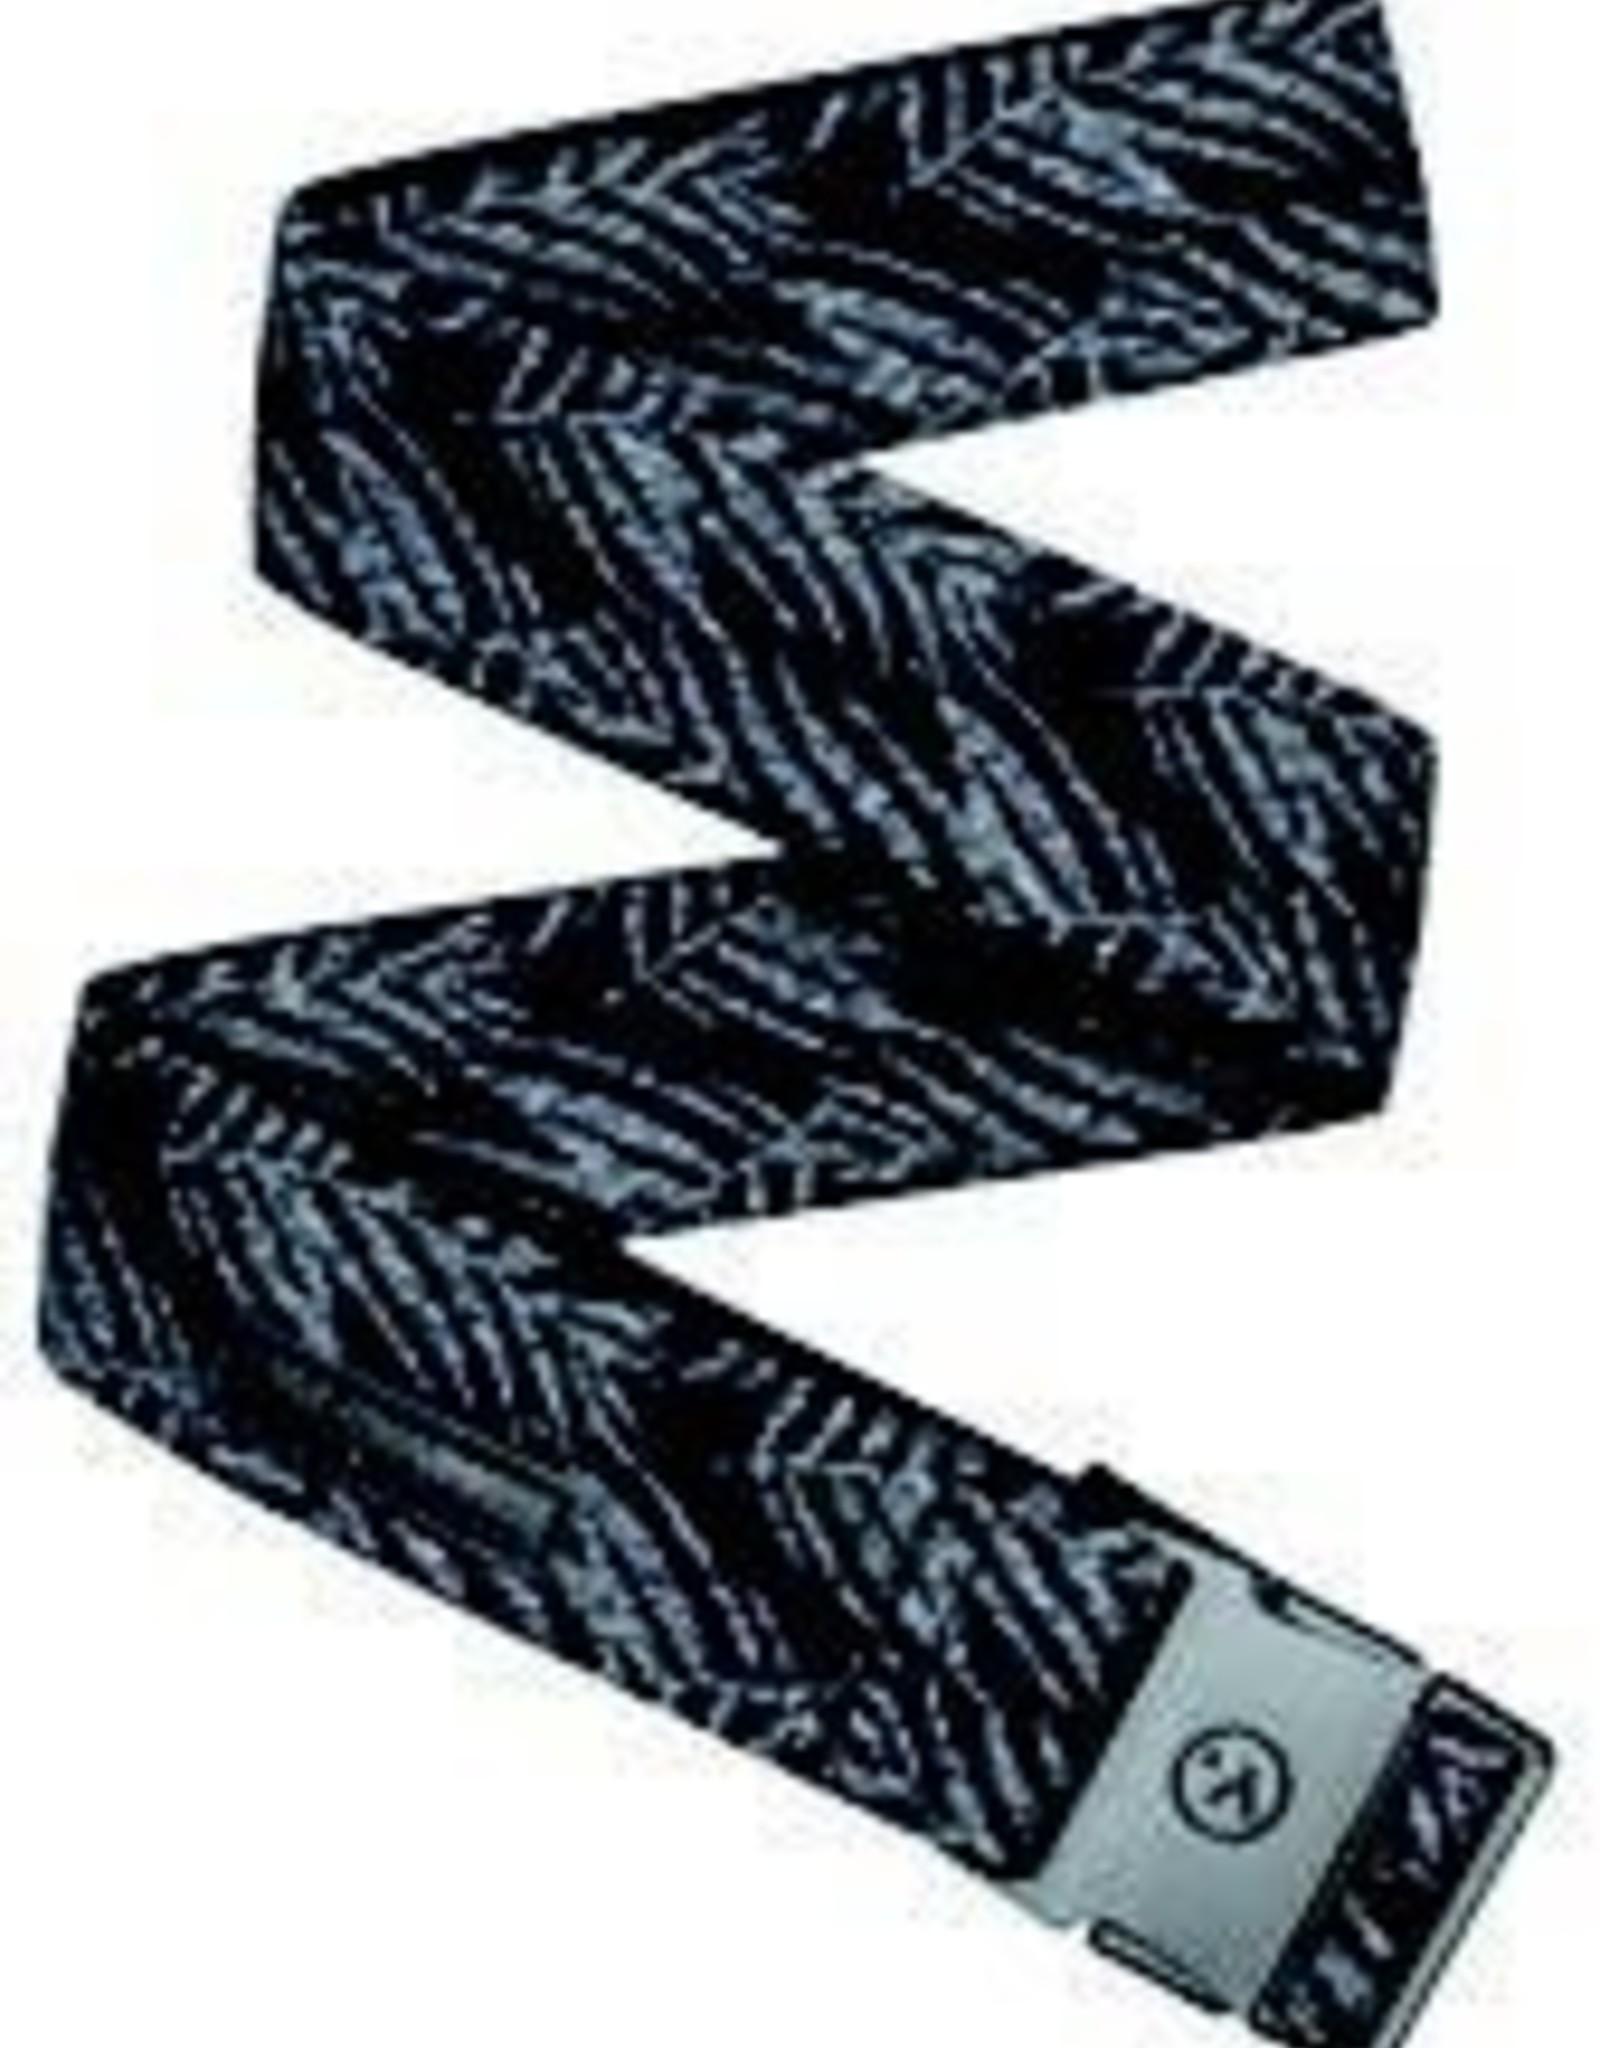 Ranger Slim Belt OSFA